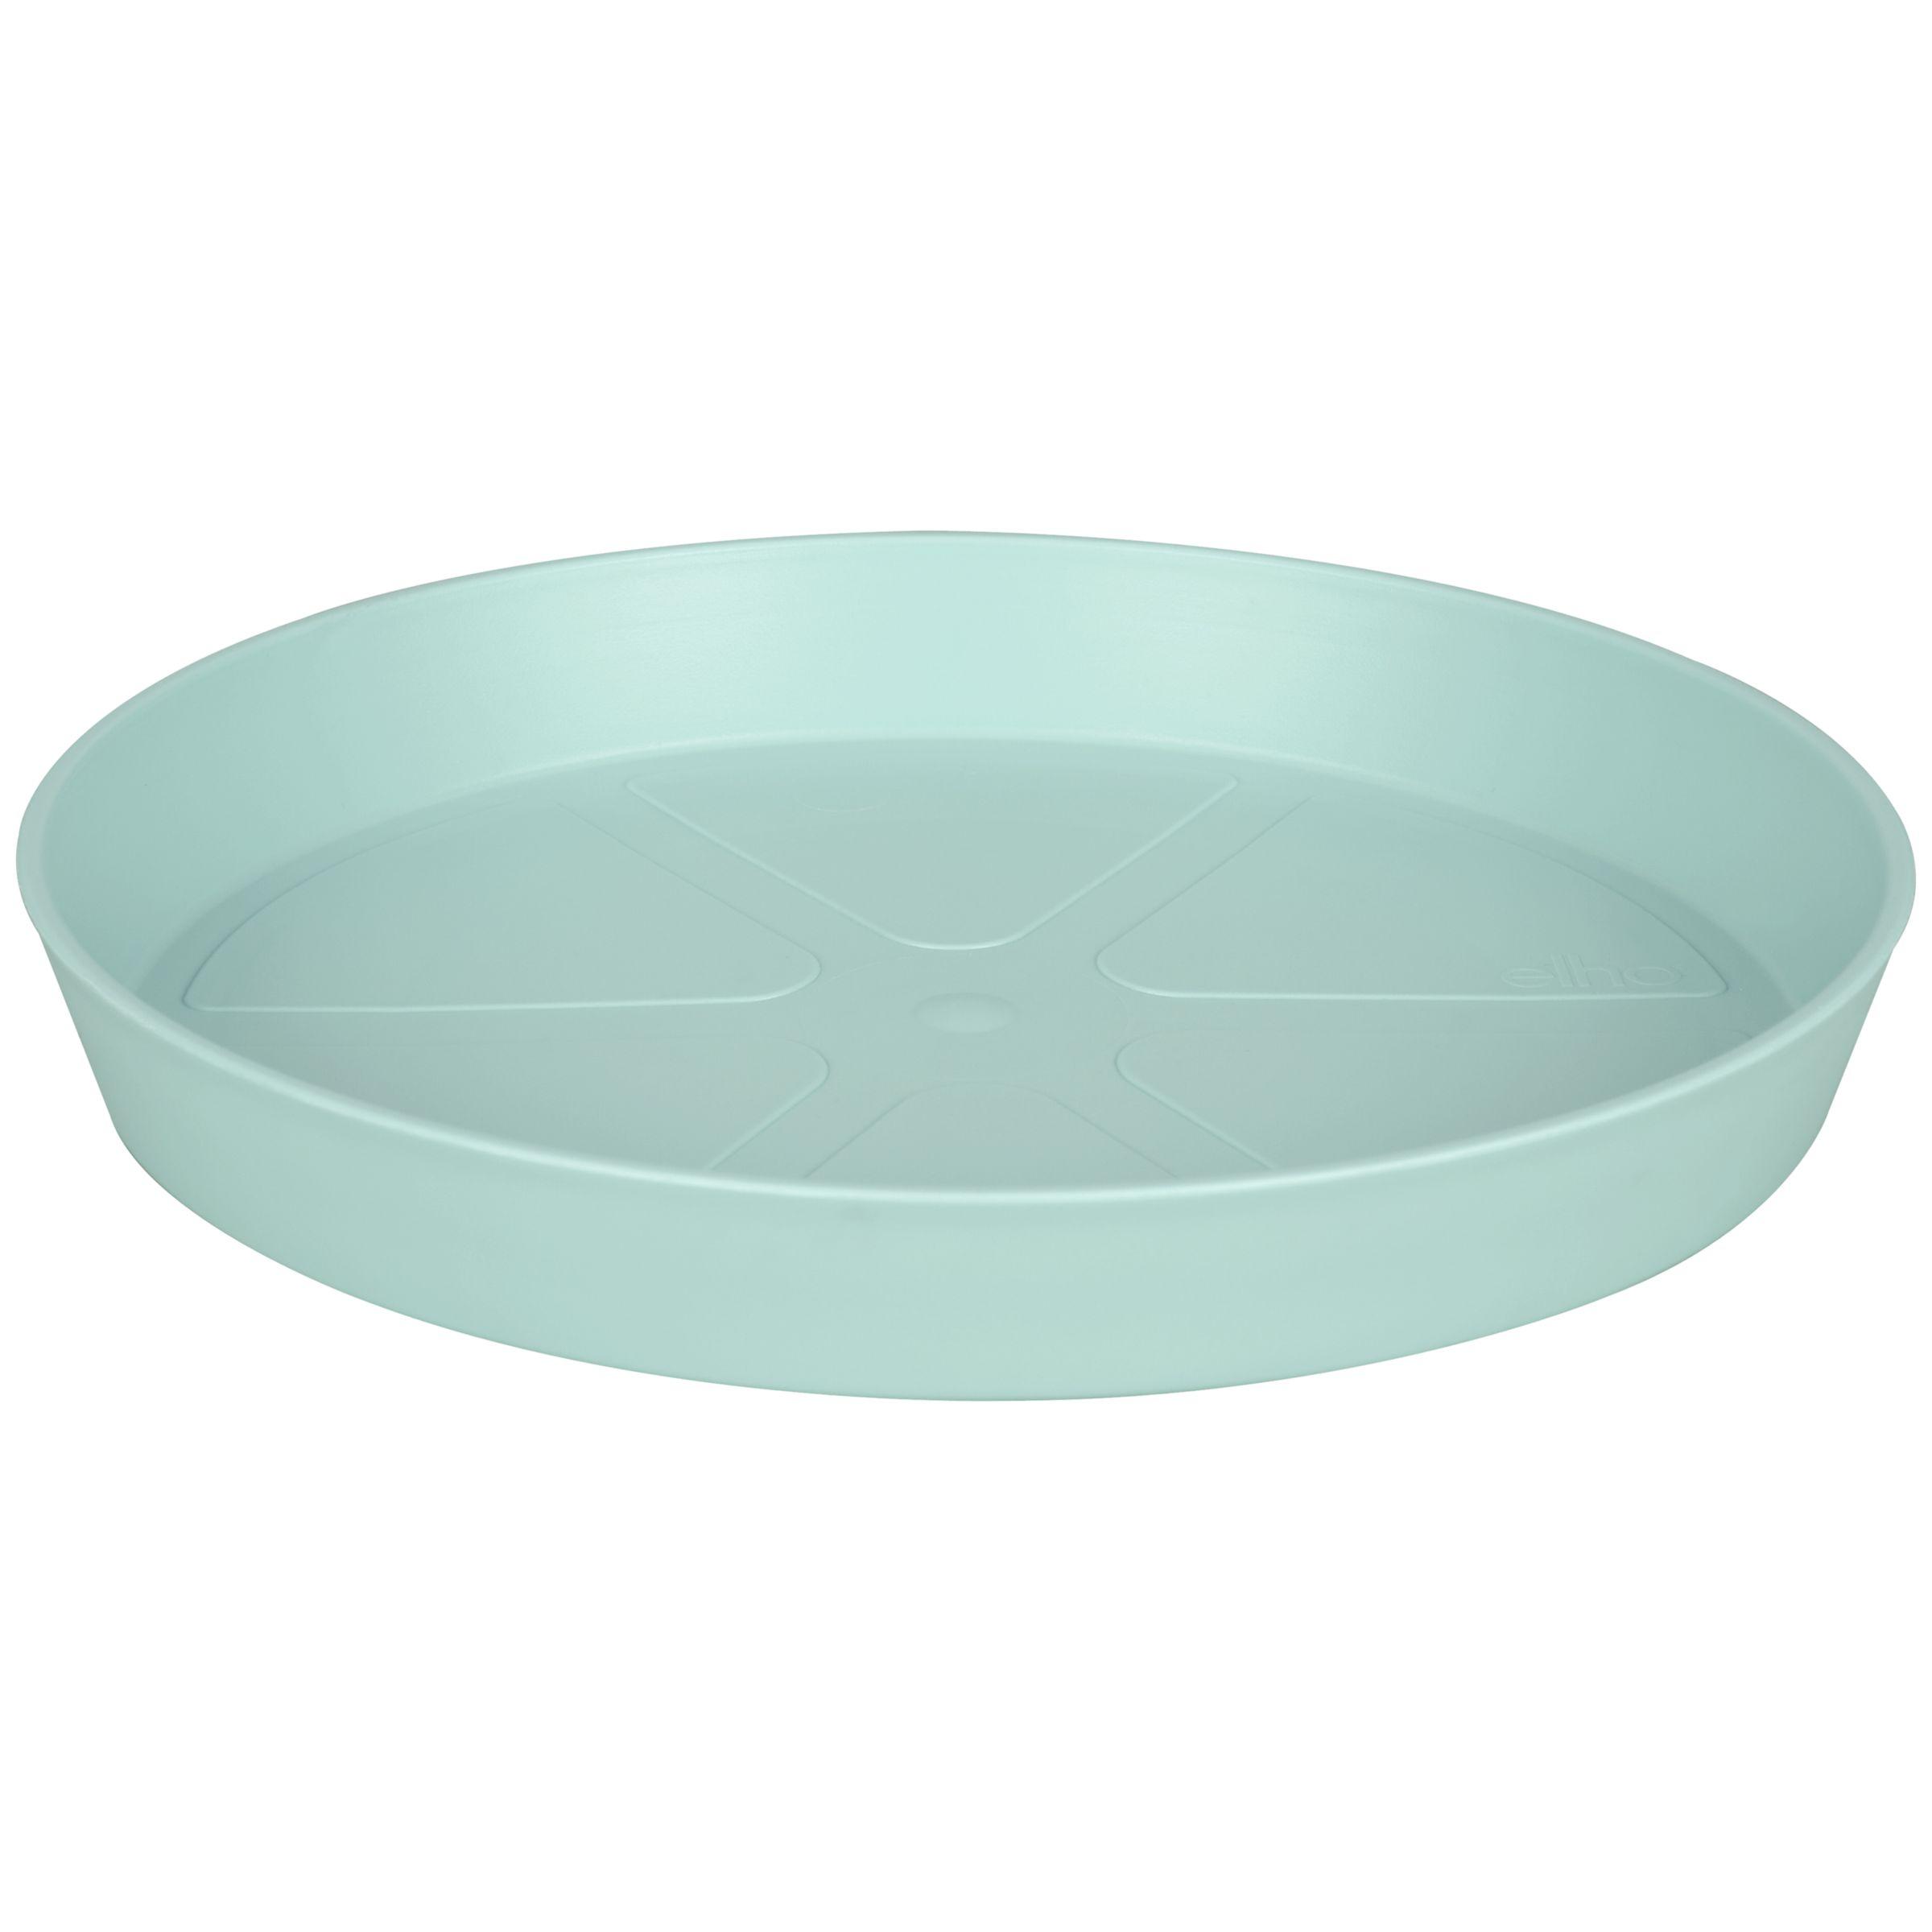 Elho Loft Saucer Round, Grey